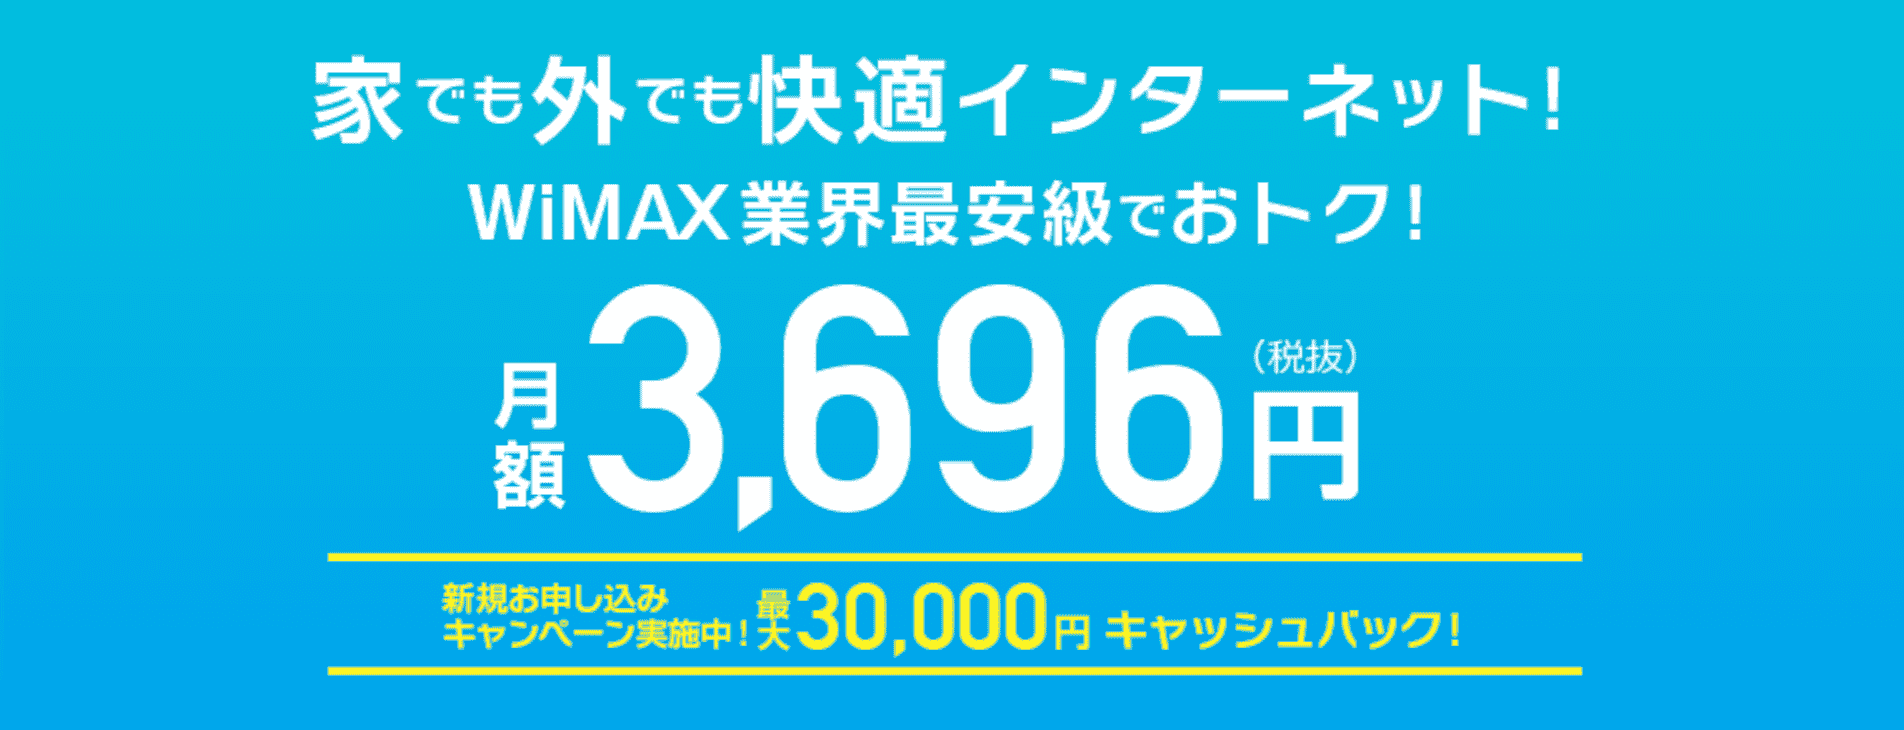 Drive WiMAXのロゴ